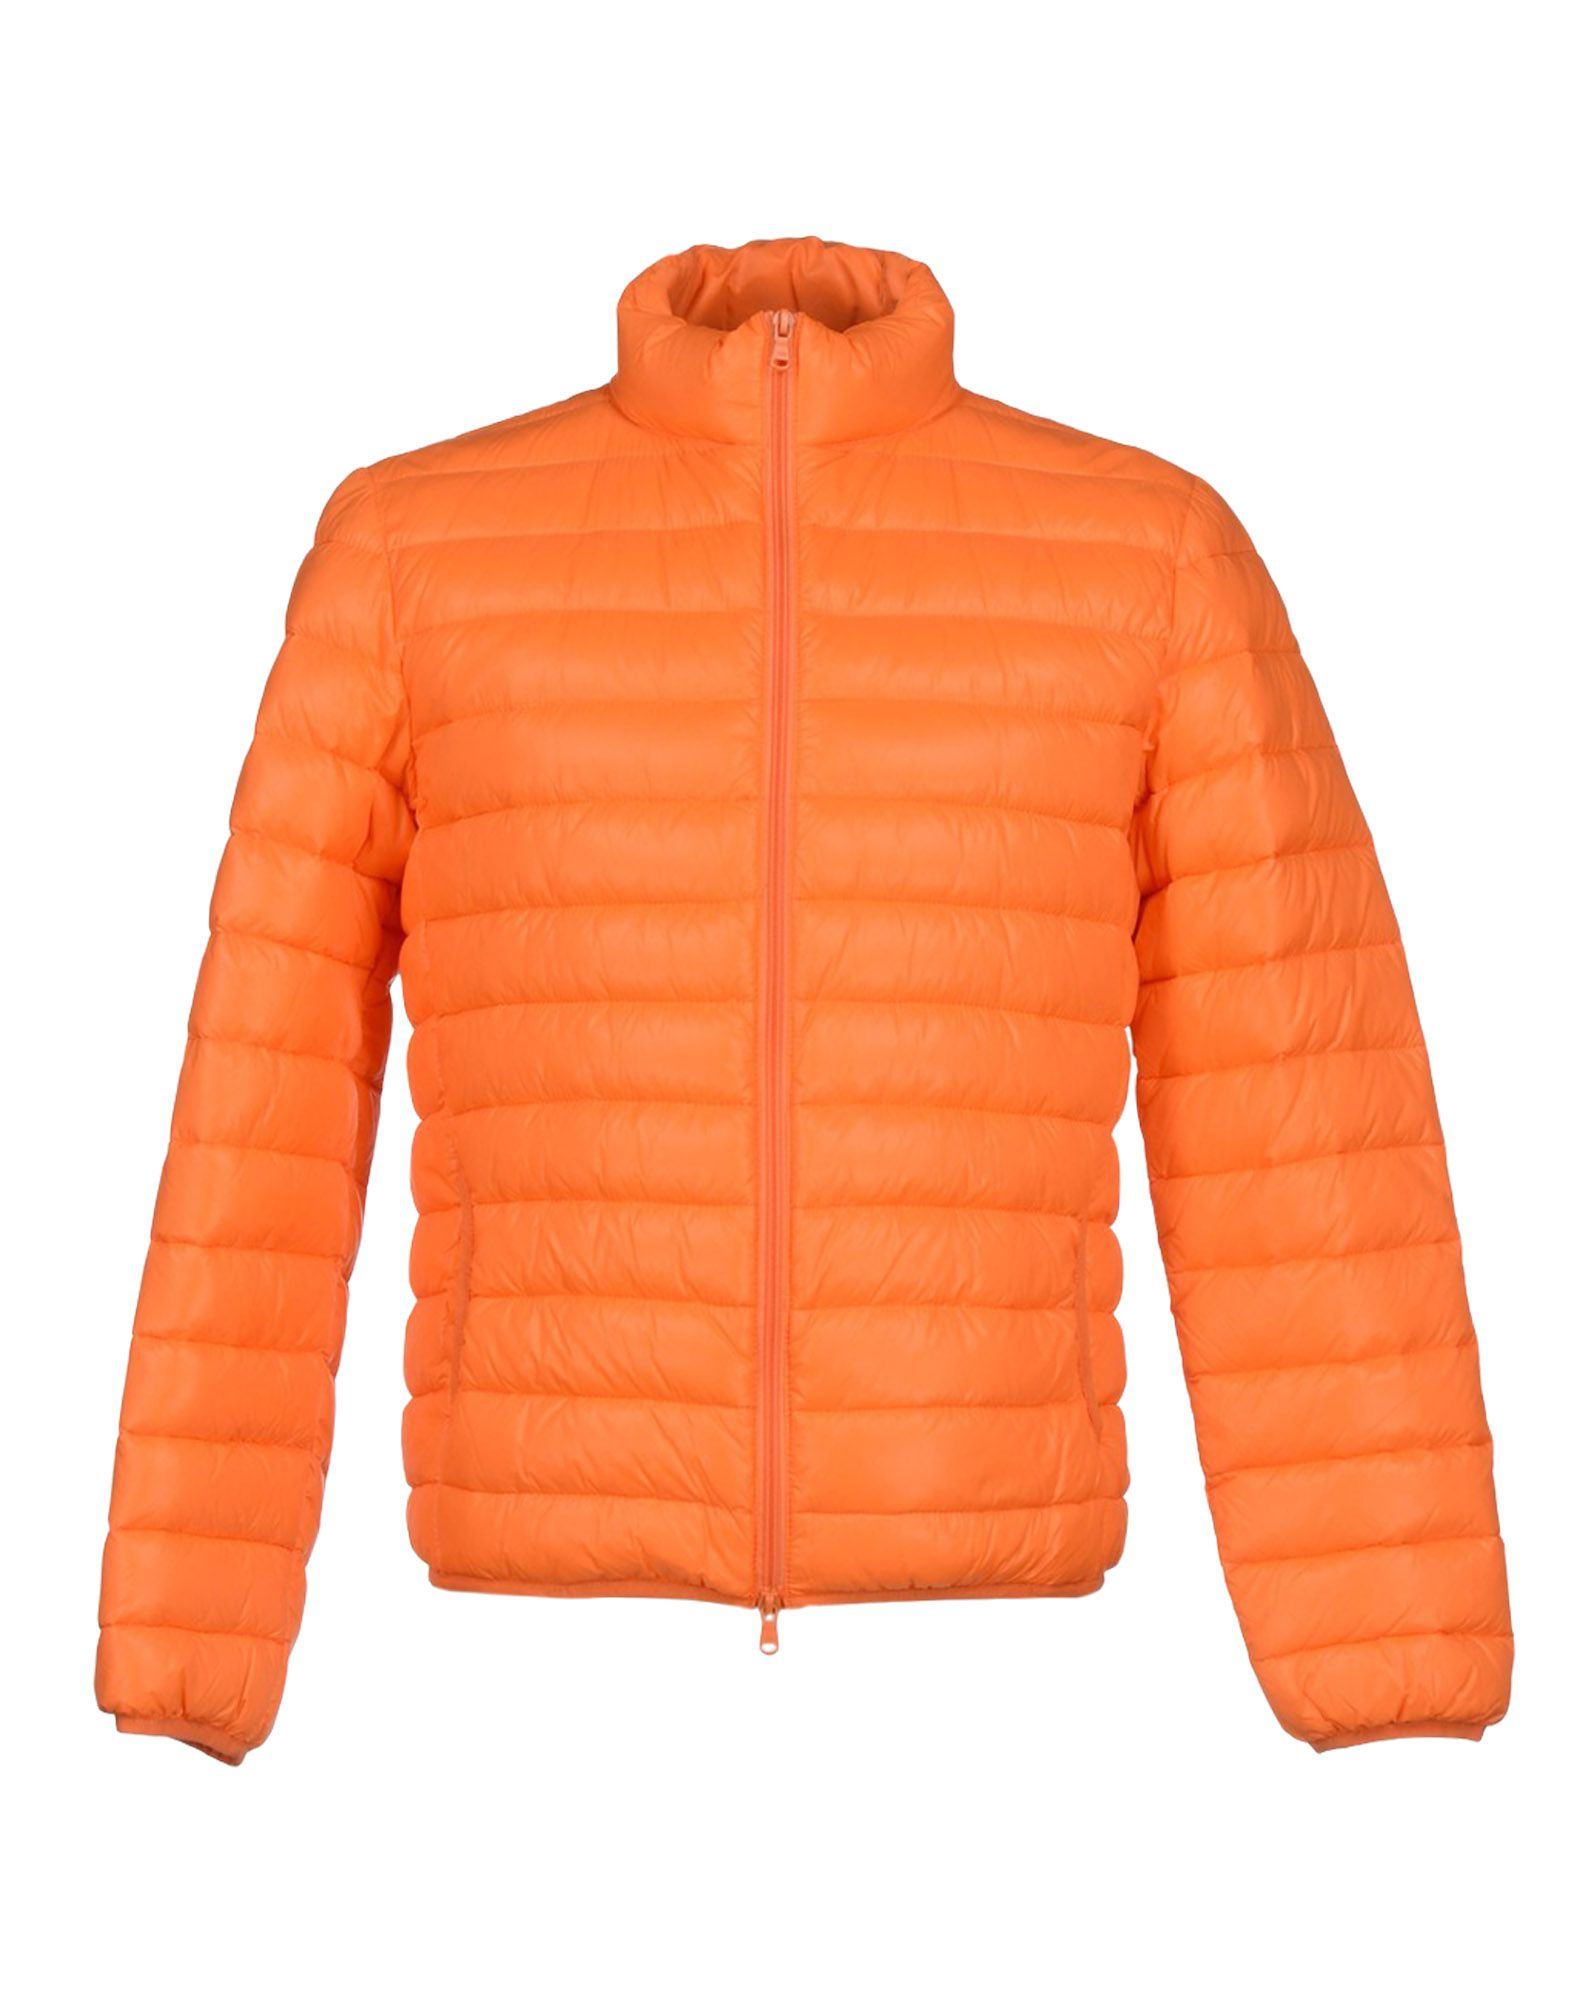 Altea Down Jacket In Orange For Men Lyst